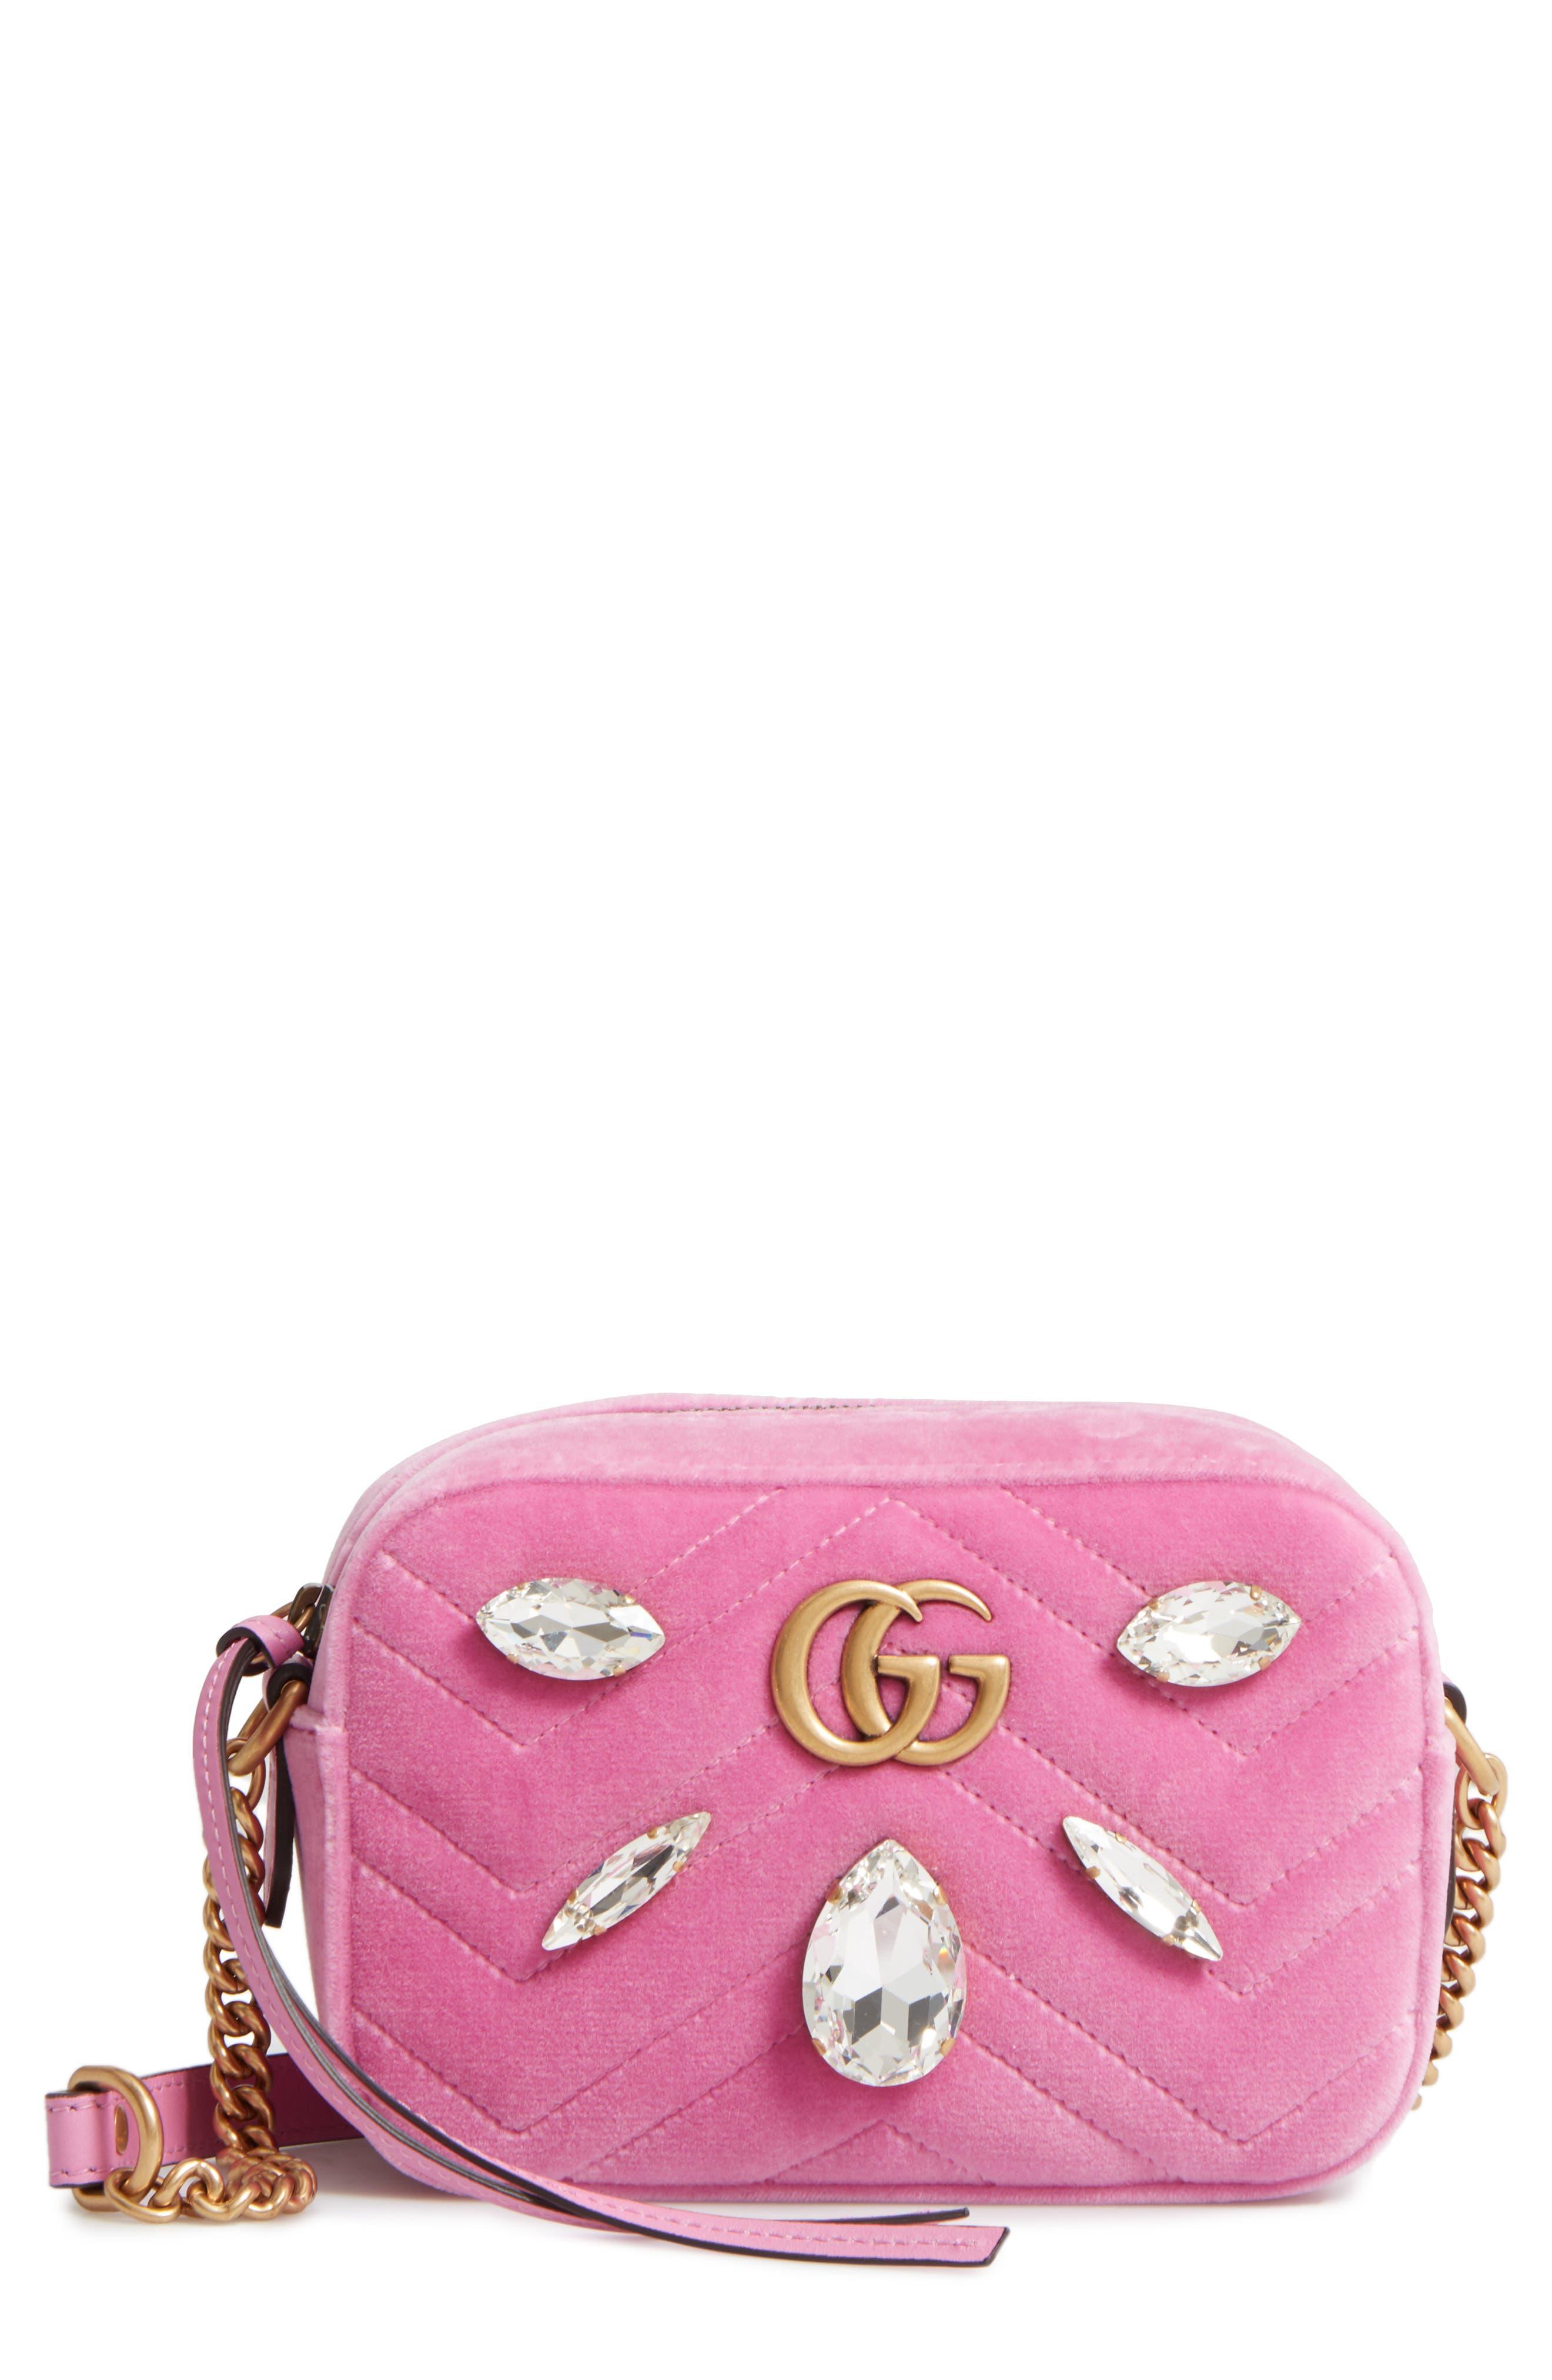 Gucci GG Marmont Crystal Matelassé Quilted Velvet Crossbody Bag